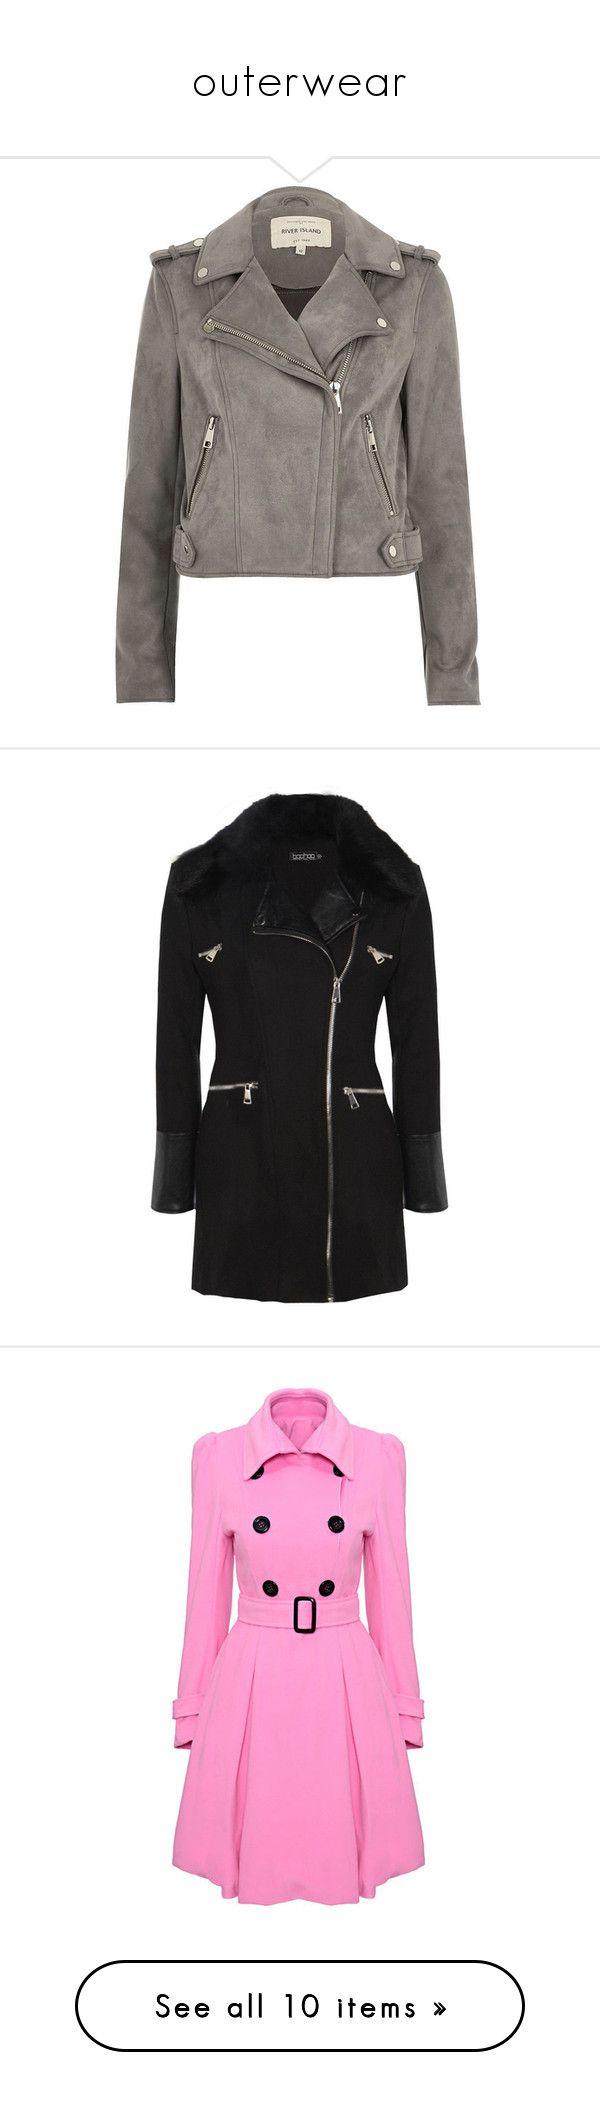 """outerwear"" by emeline-rivera ❤ liked on Polyvore featuring outerwear, jackets, grey, jakker, metallic moto jacket, grey moto jacket, metallic jacket, grey jacket, tall biker jacket and coats"